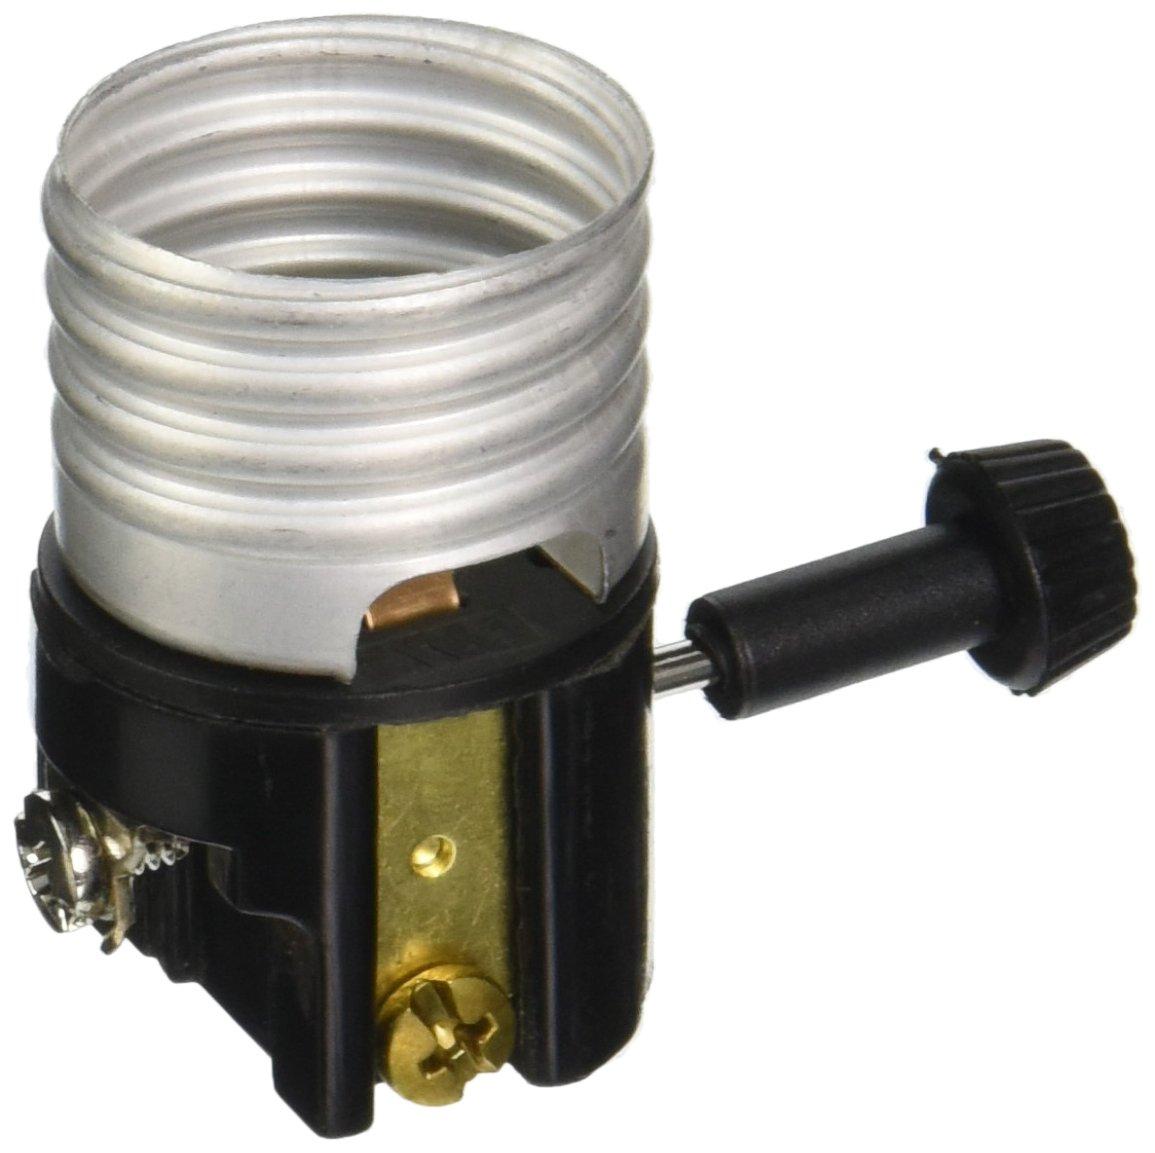 Pass /& Seymour 7090MBPCC5 3-Way Incandescent Turn Knob Metal Shell Lamp Holder Interior Socket 250V 250W